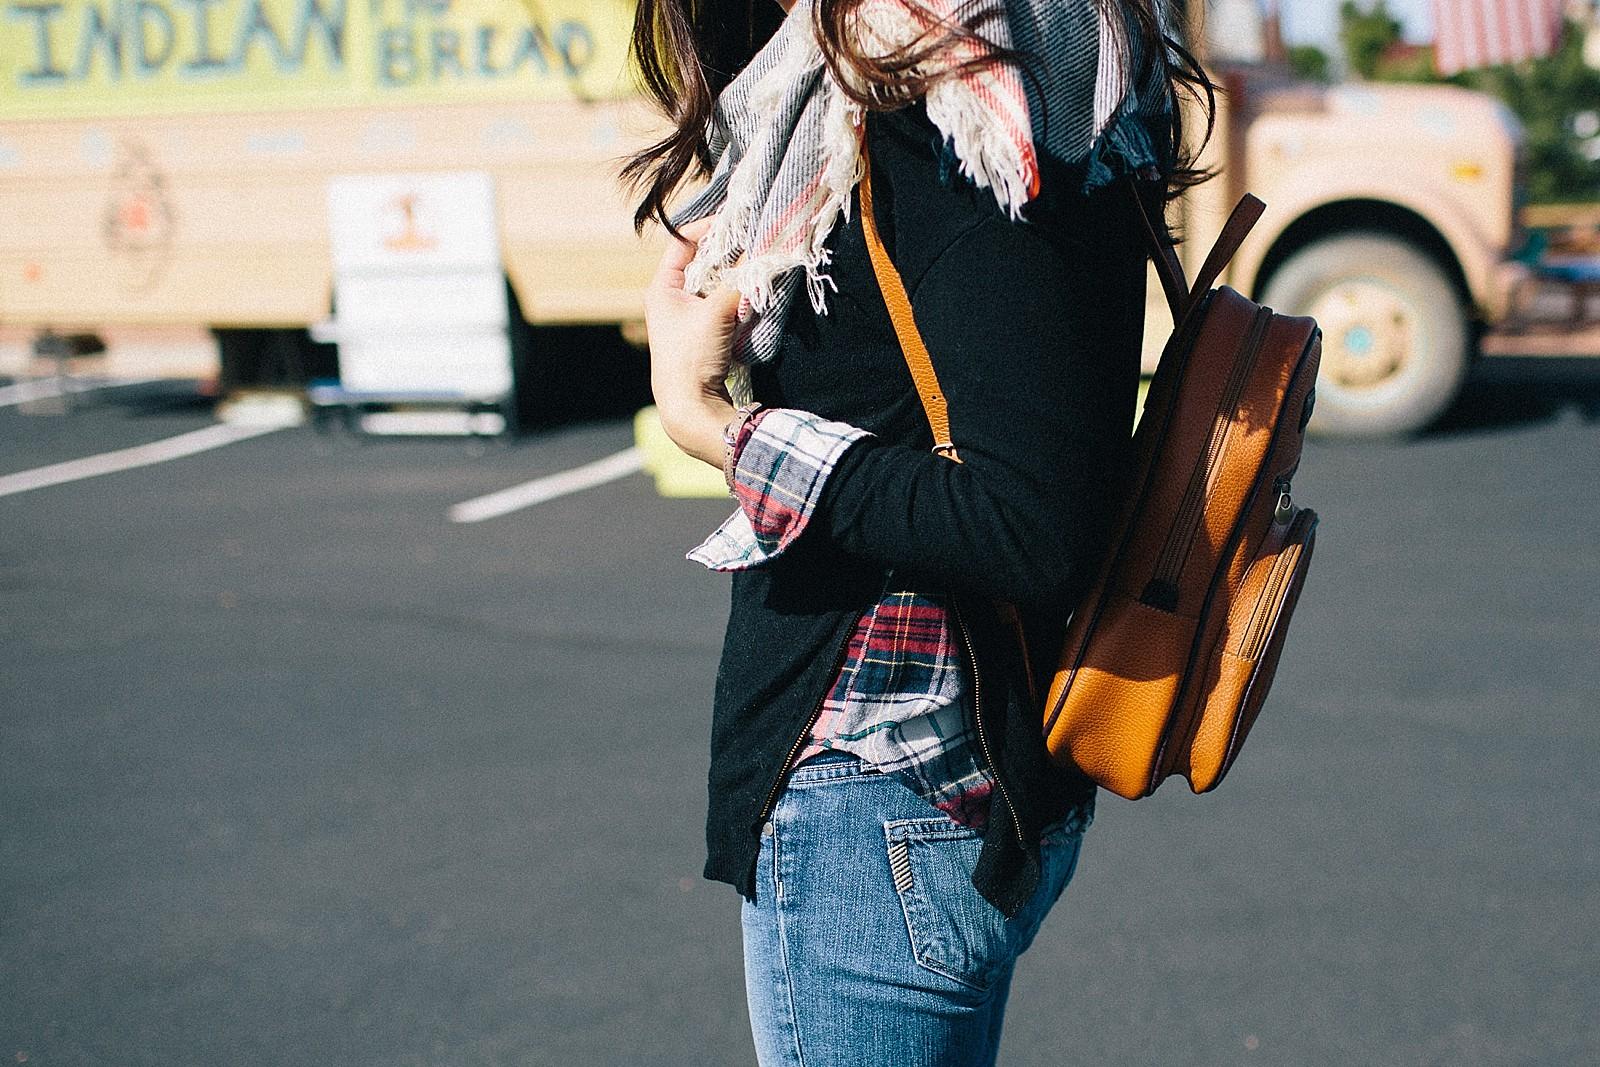 payson-arizona-phoenix-blogger-lifestyle-fashion-beauty-leather-backpack-travel-capolavori-3248